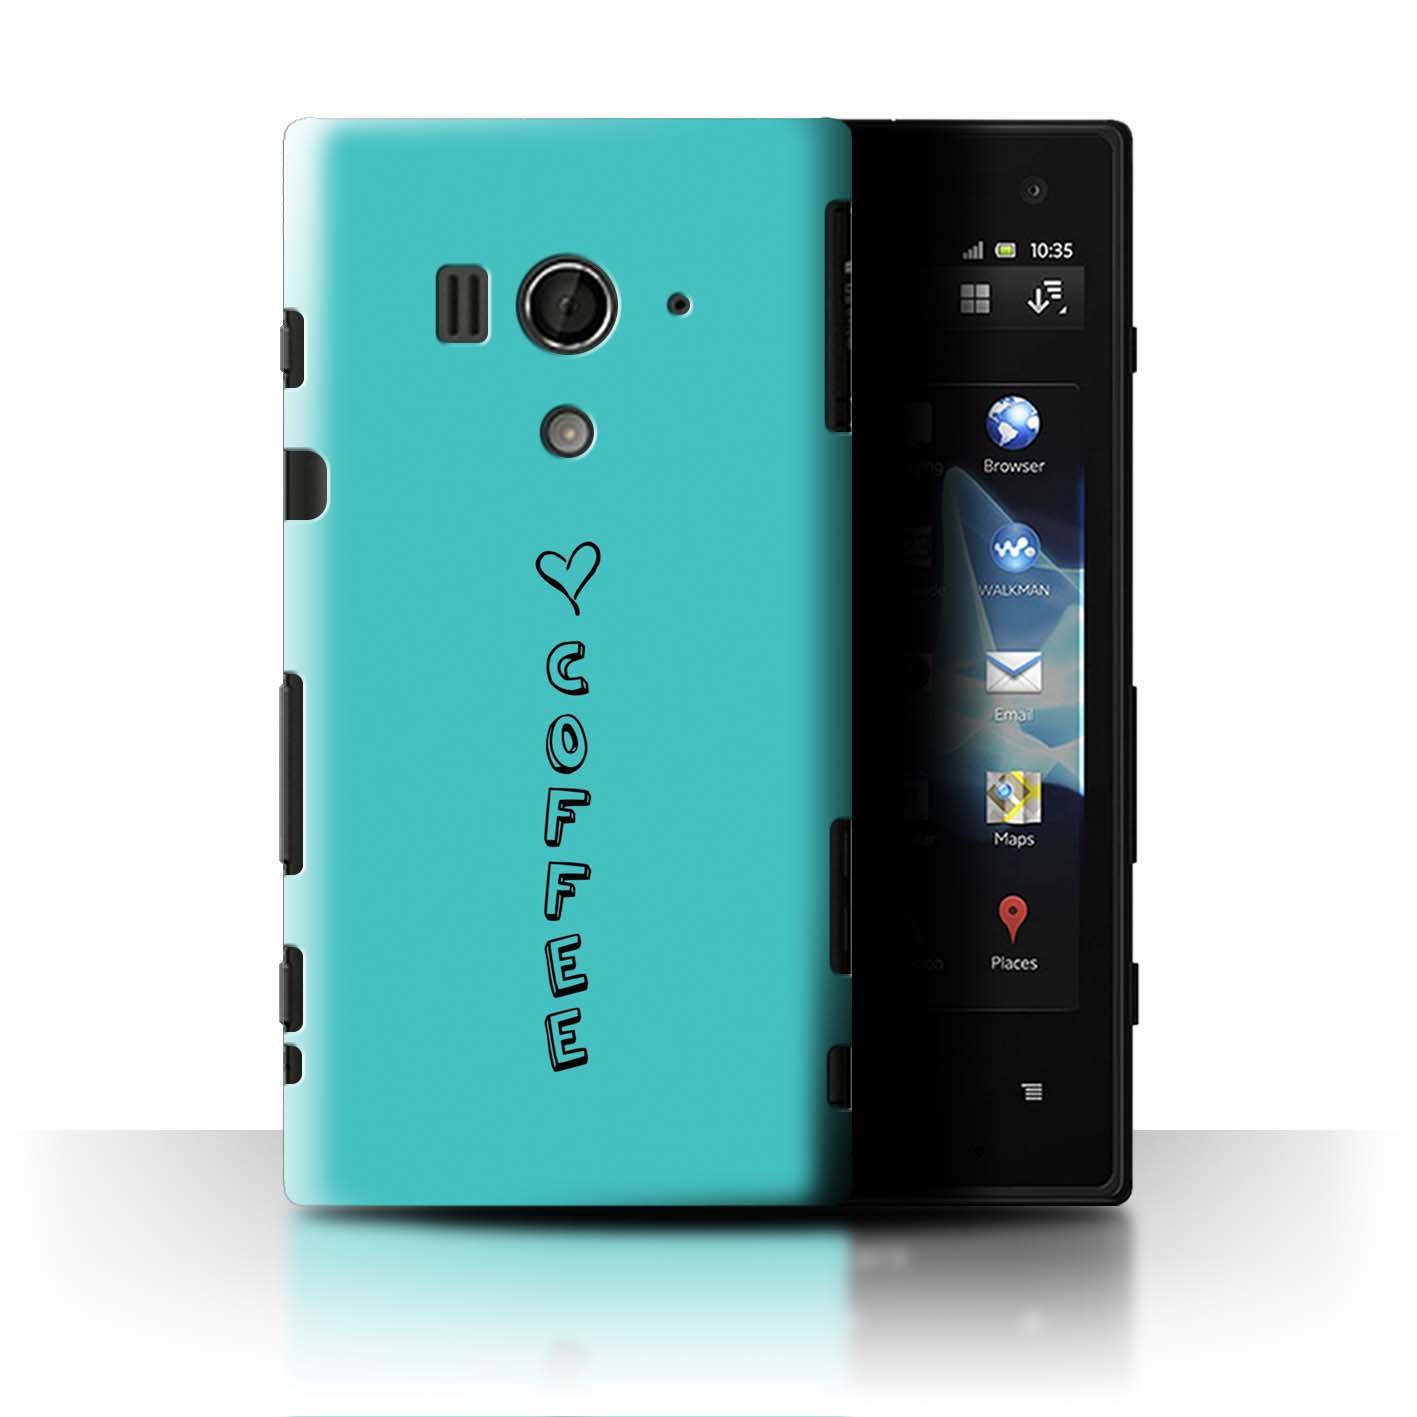 Stuff 4 teléfono caso/cubierta posterior para Sony Xperia Acro S/LT26w/Corazón Xoxo